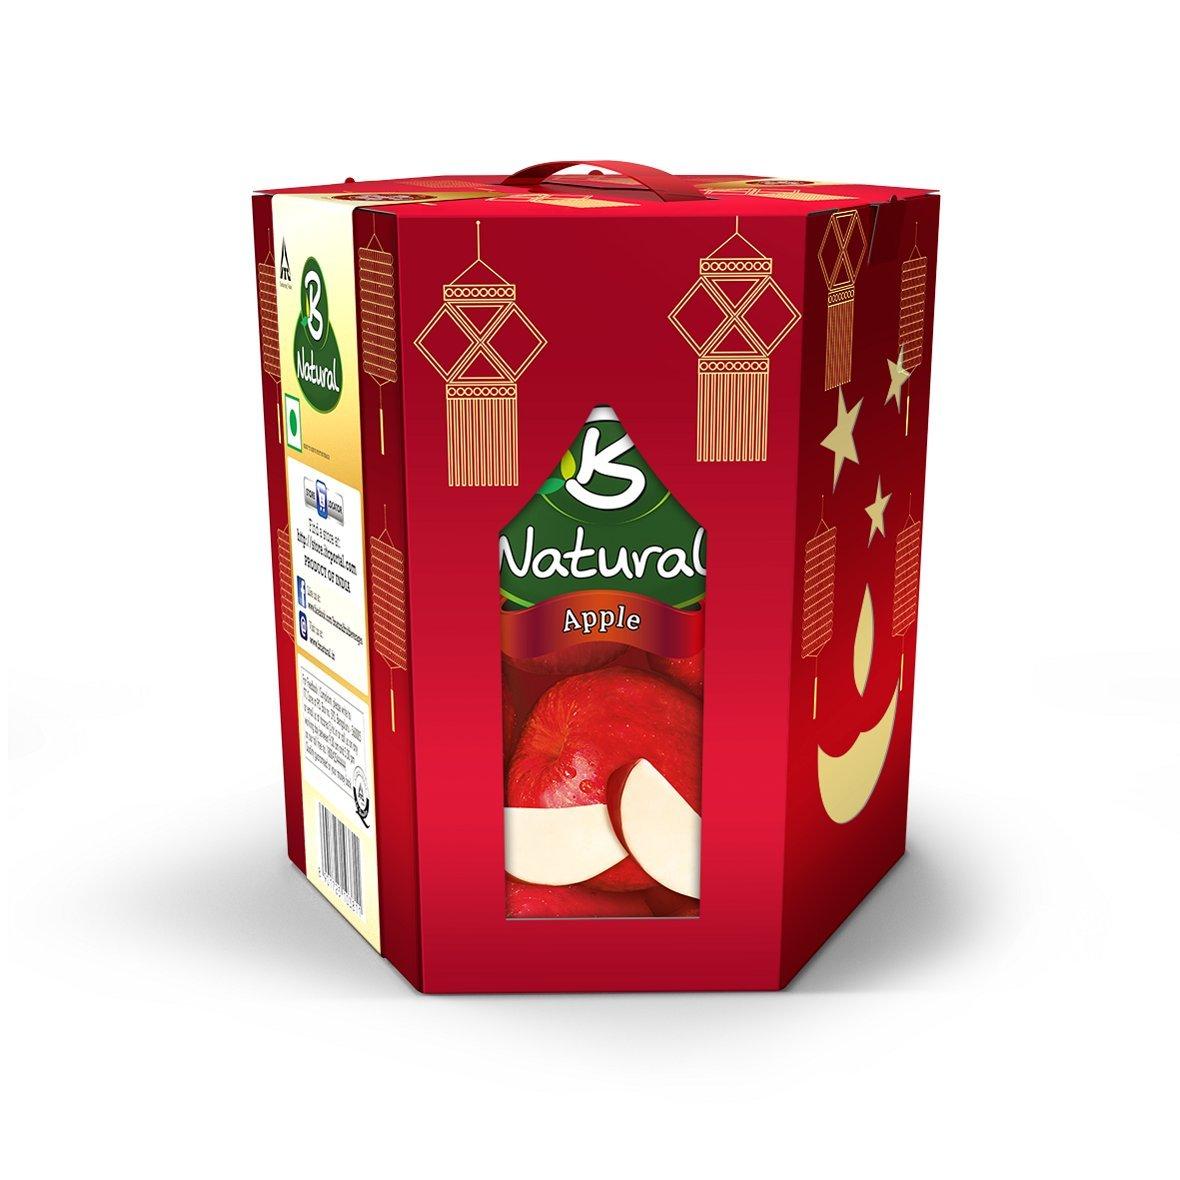 B Natural Lantern Pack, 3 L